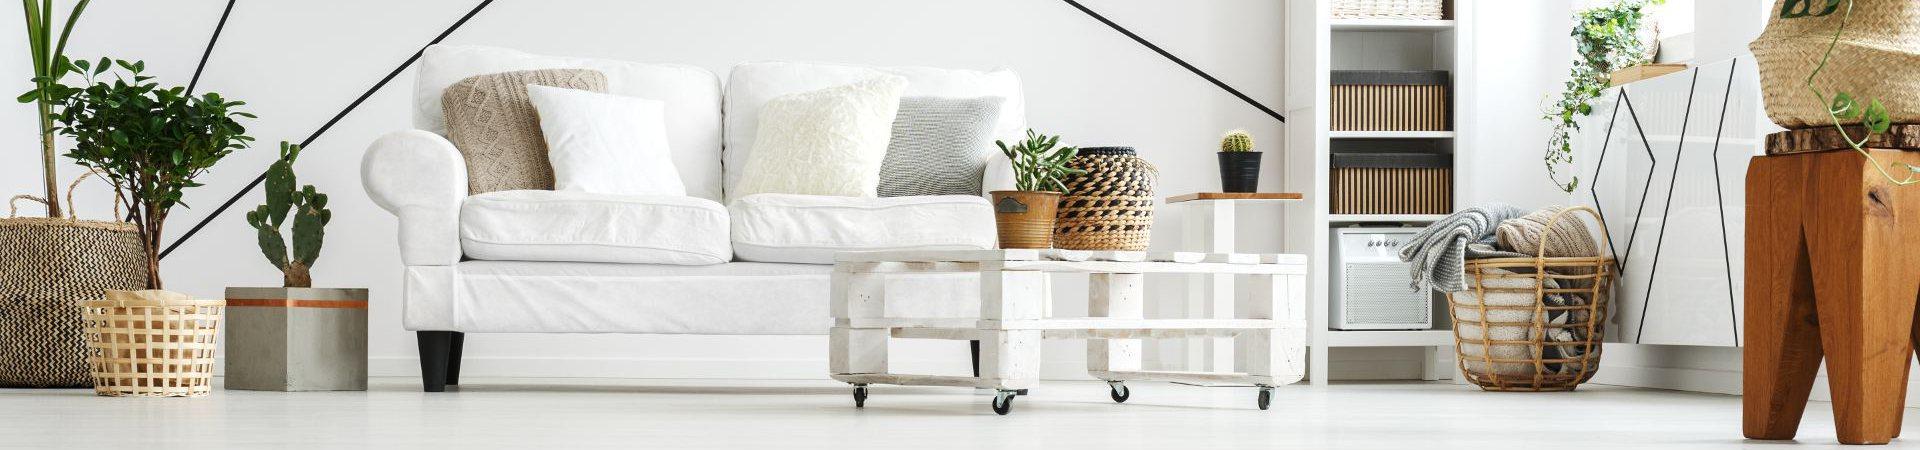 interior design decoration service 450